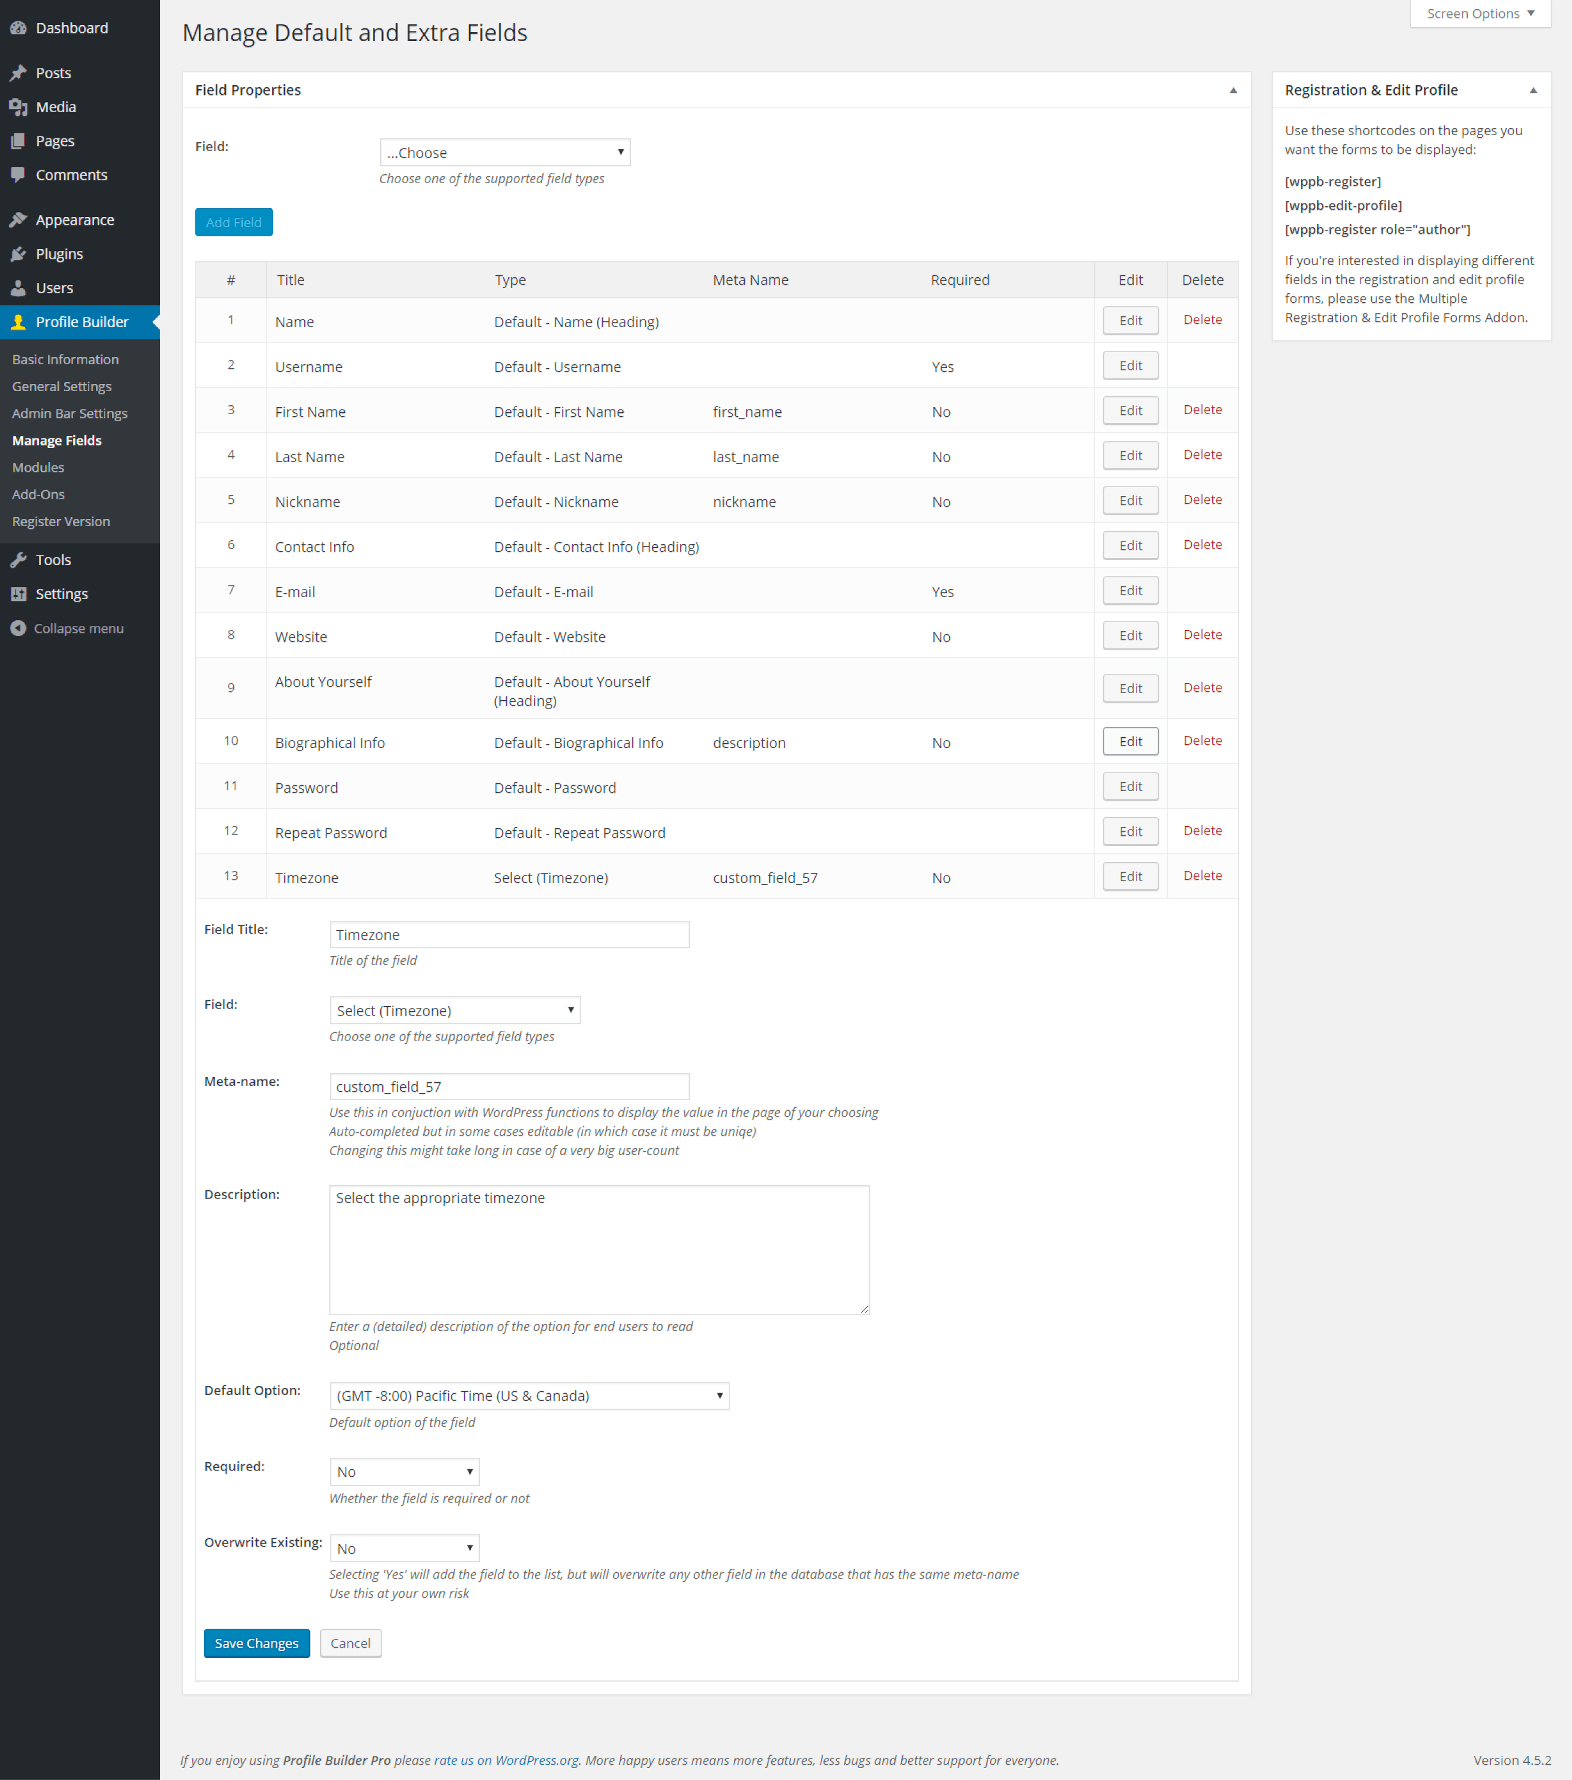 Profile Builder - Select (Timezone) Field Back End